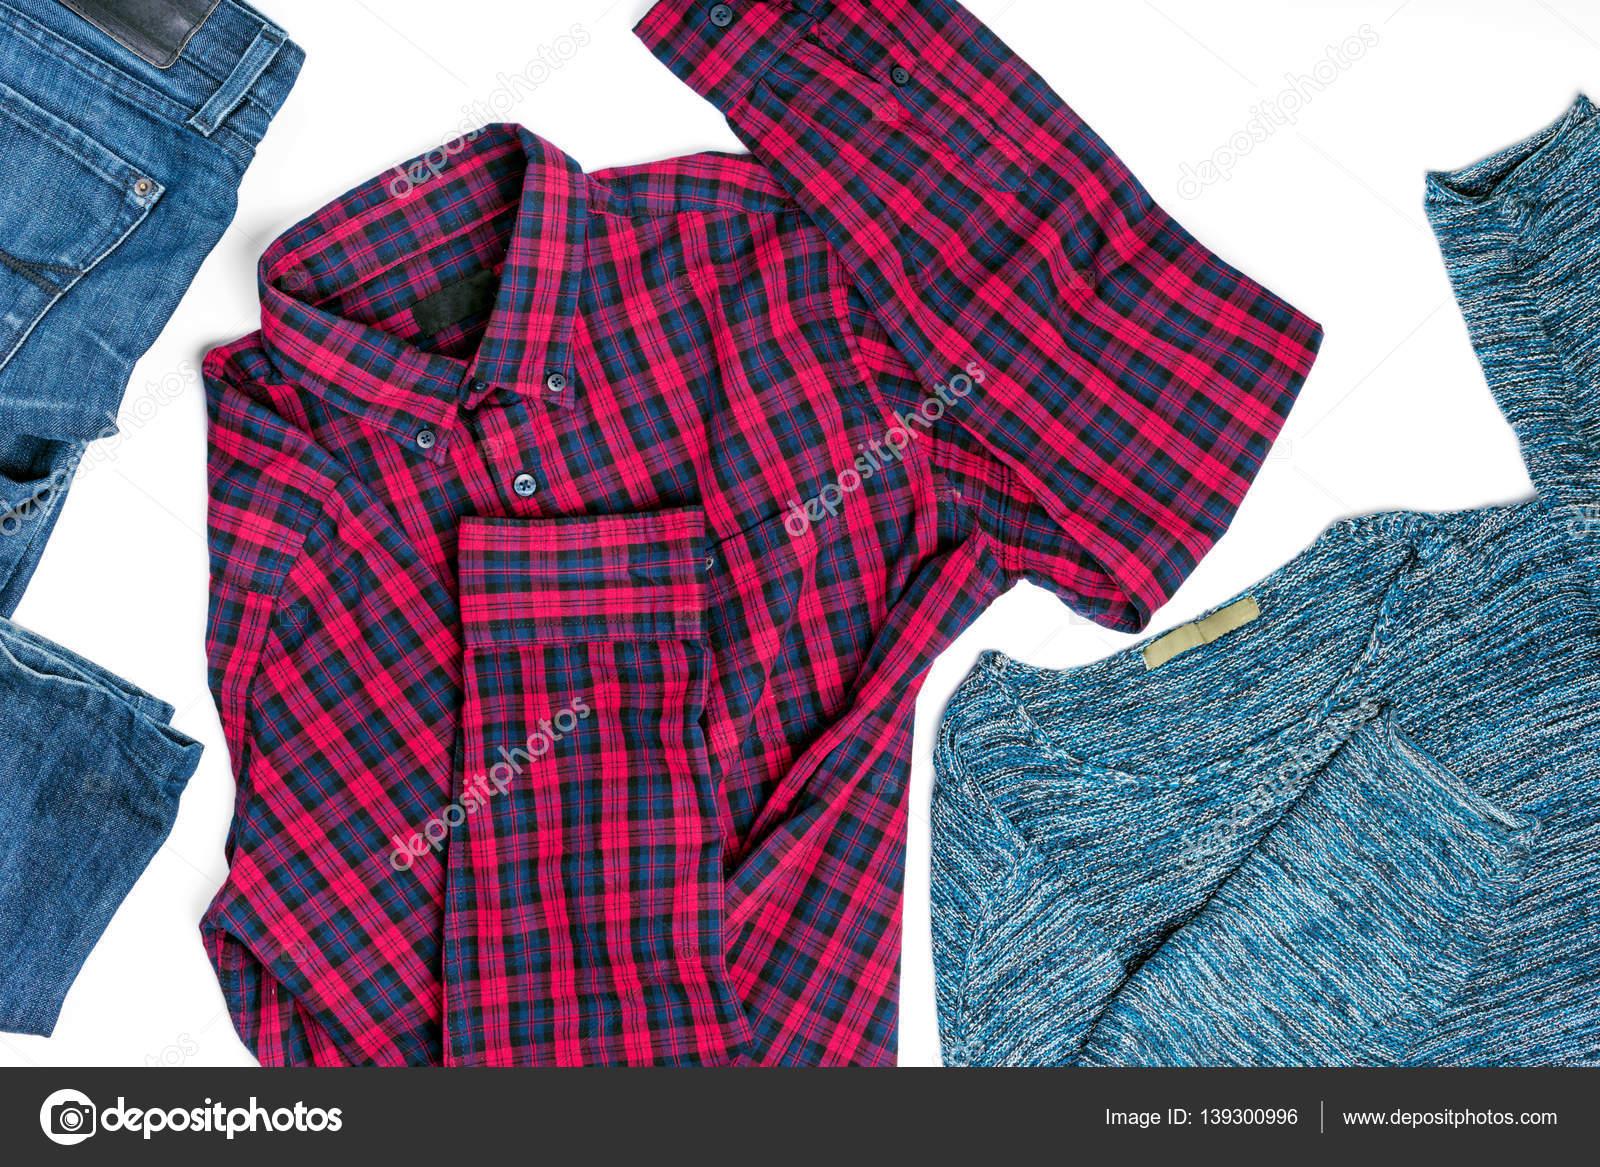 180dc9611356 Επίπεδη lay mens ρούχα κολάζ με πουκάμισο